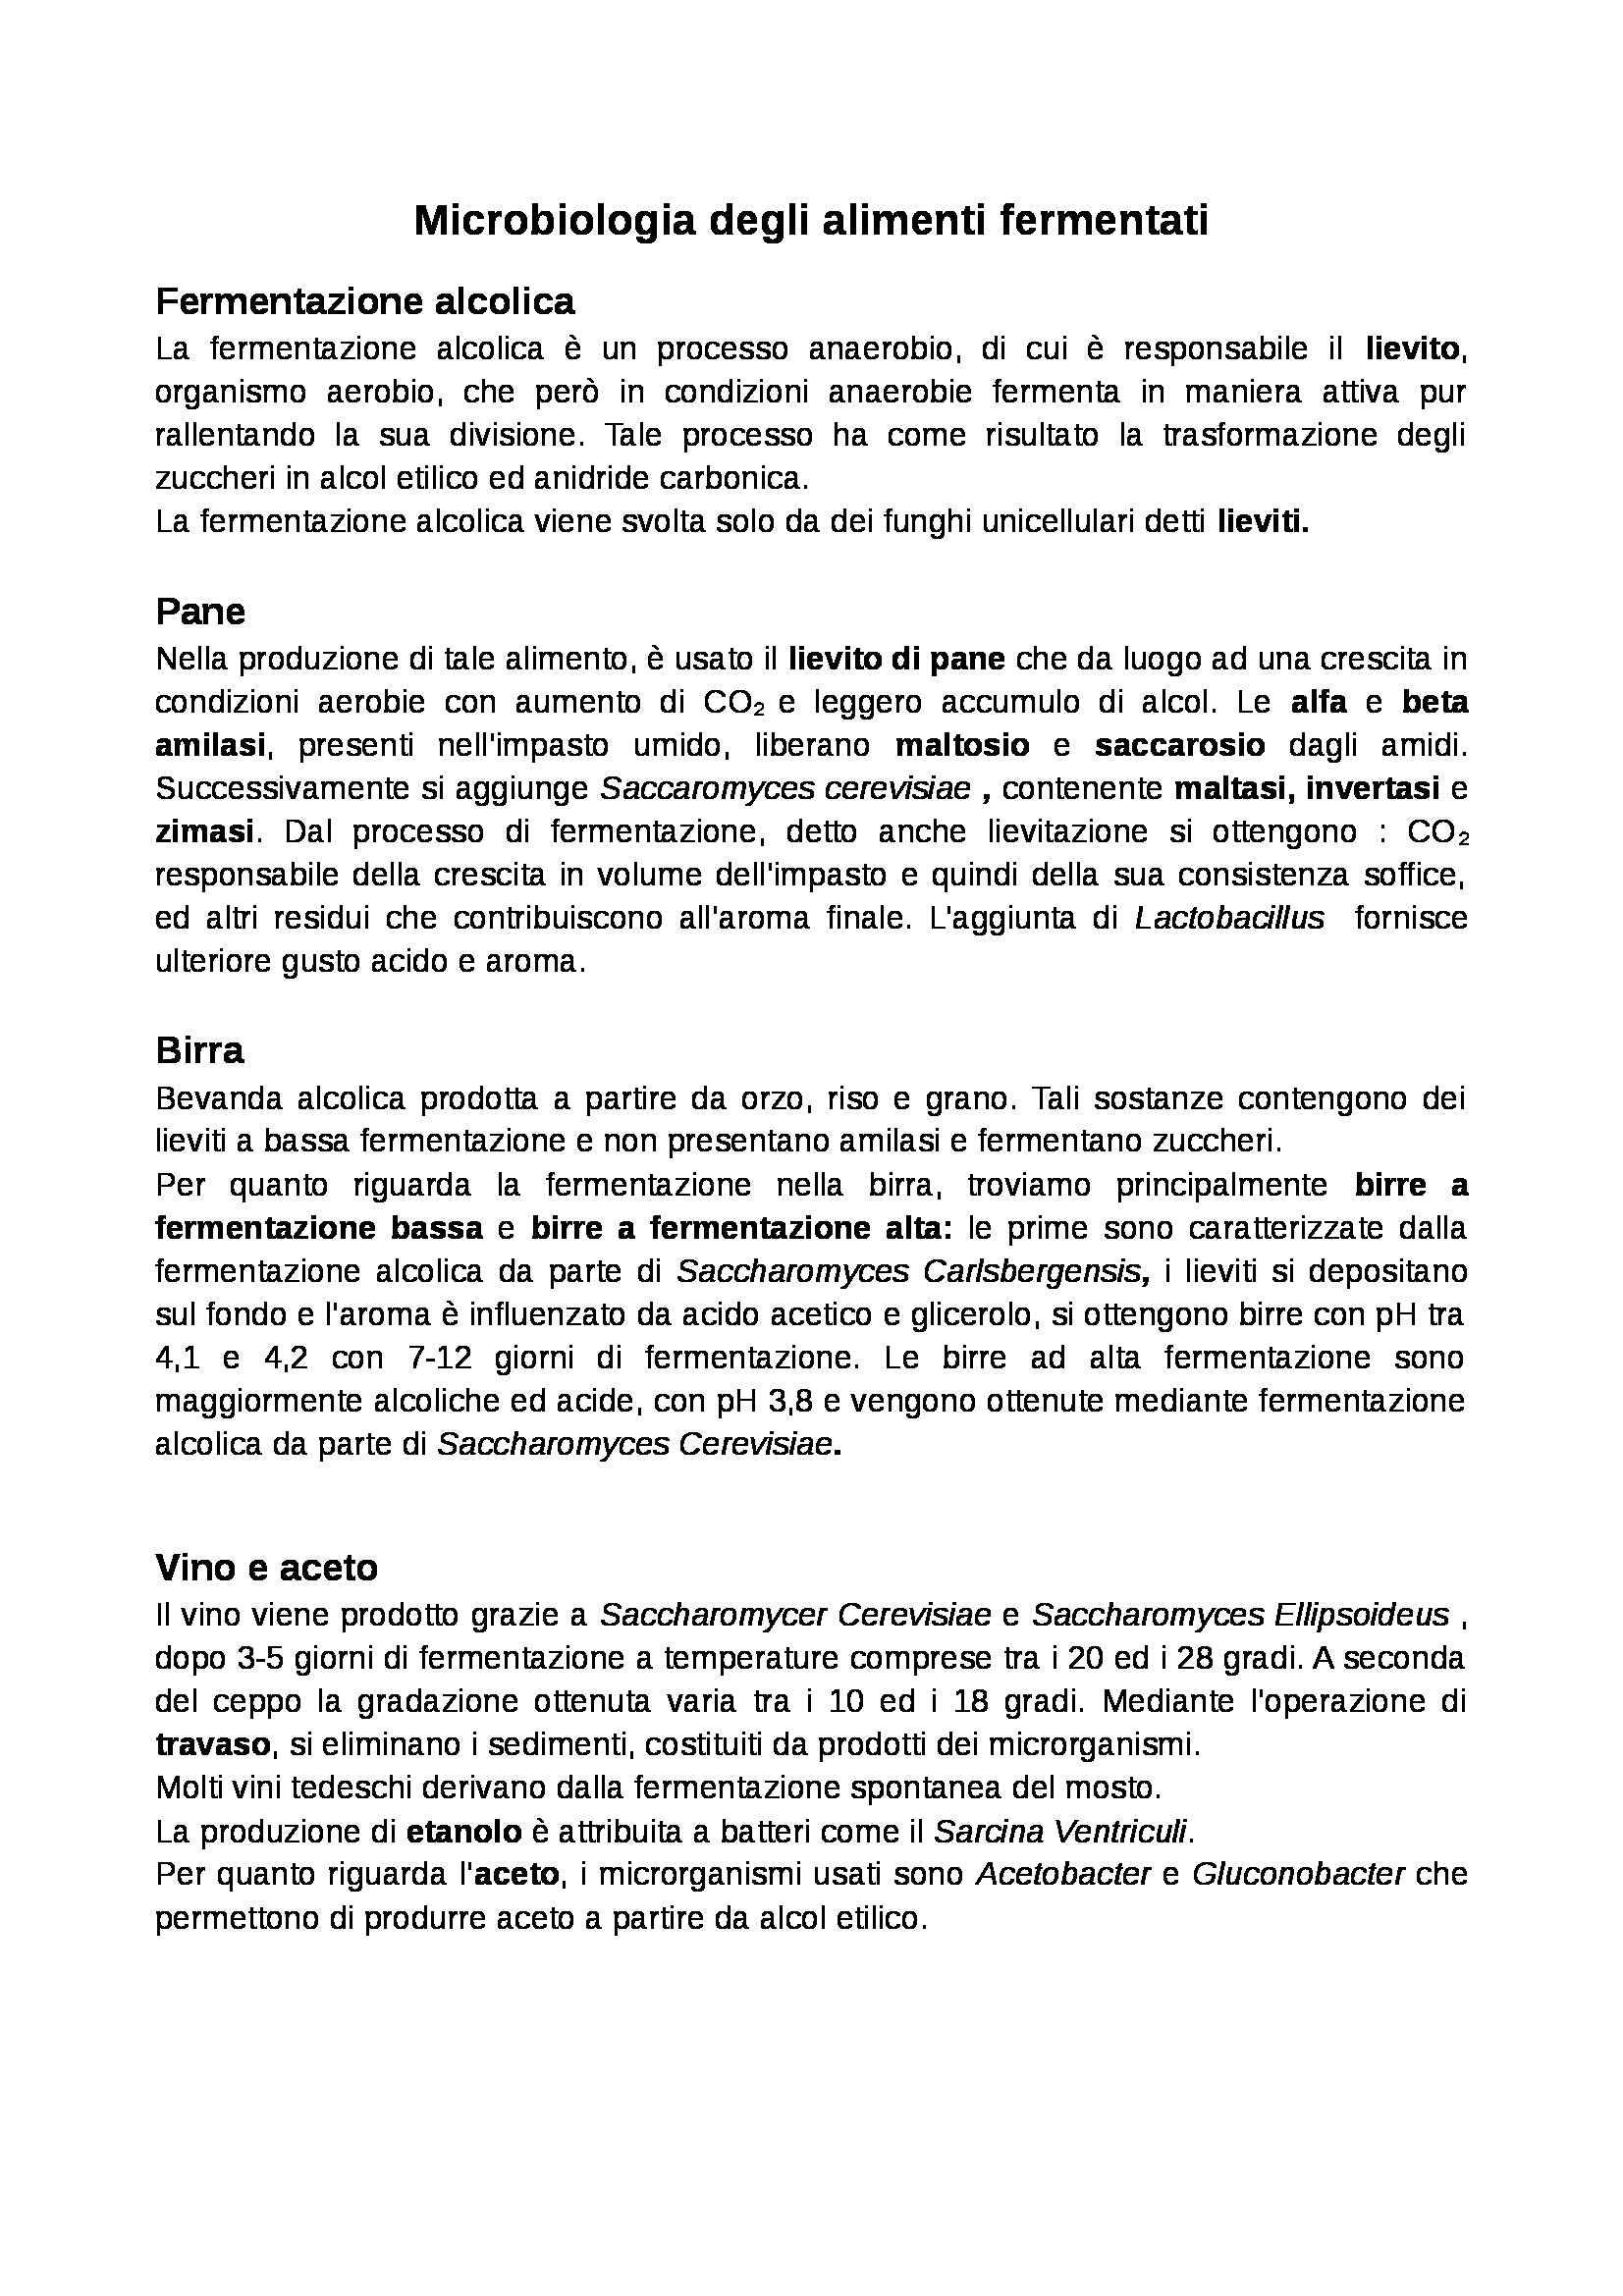 Microbiologia generale - microbiologia degli alimenti fermentati